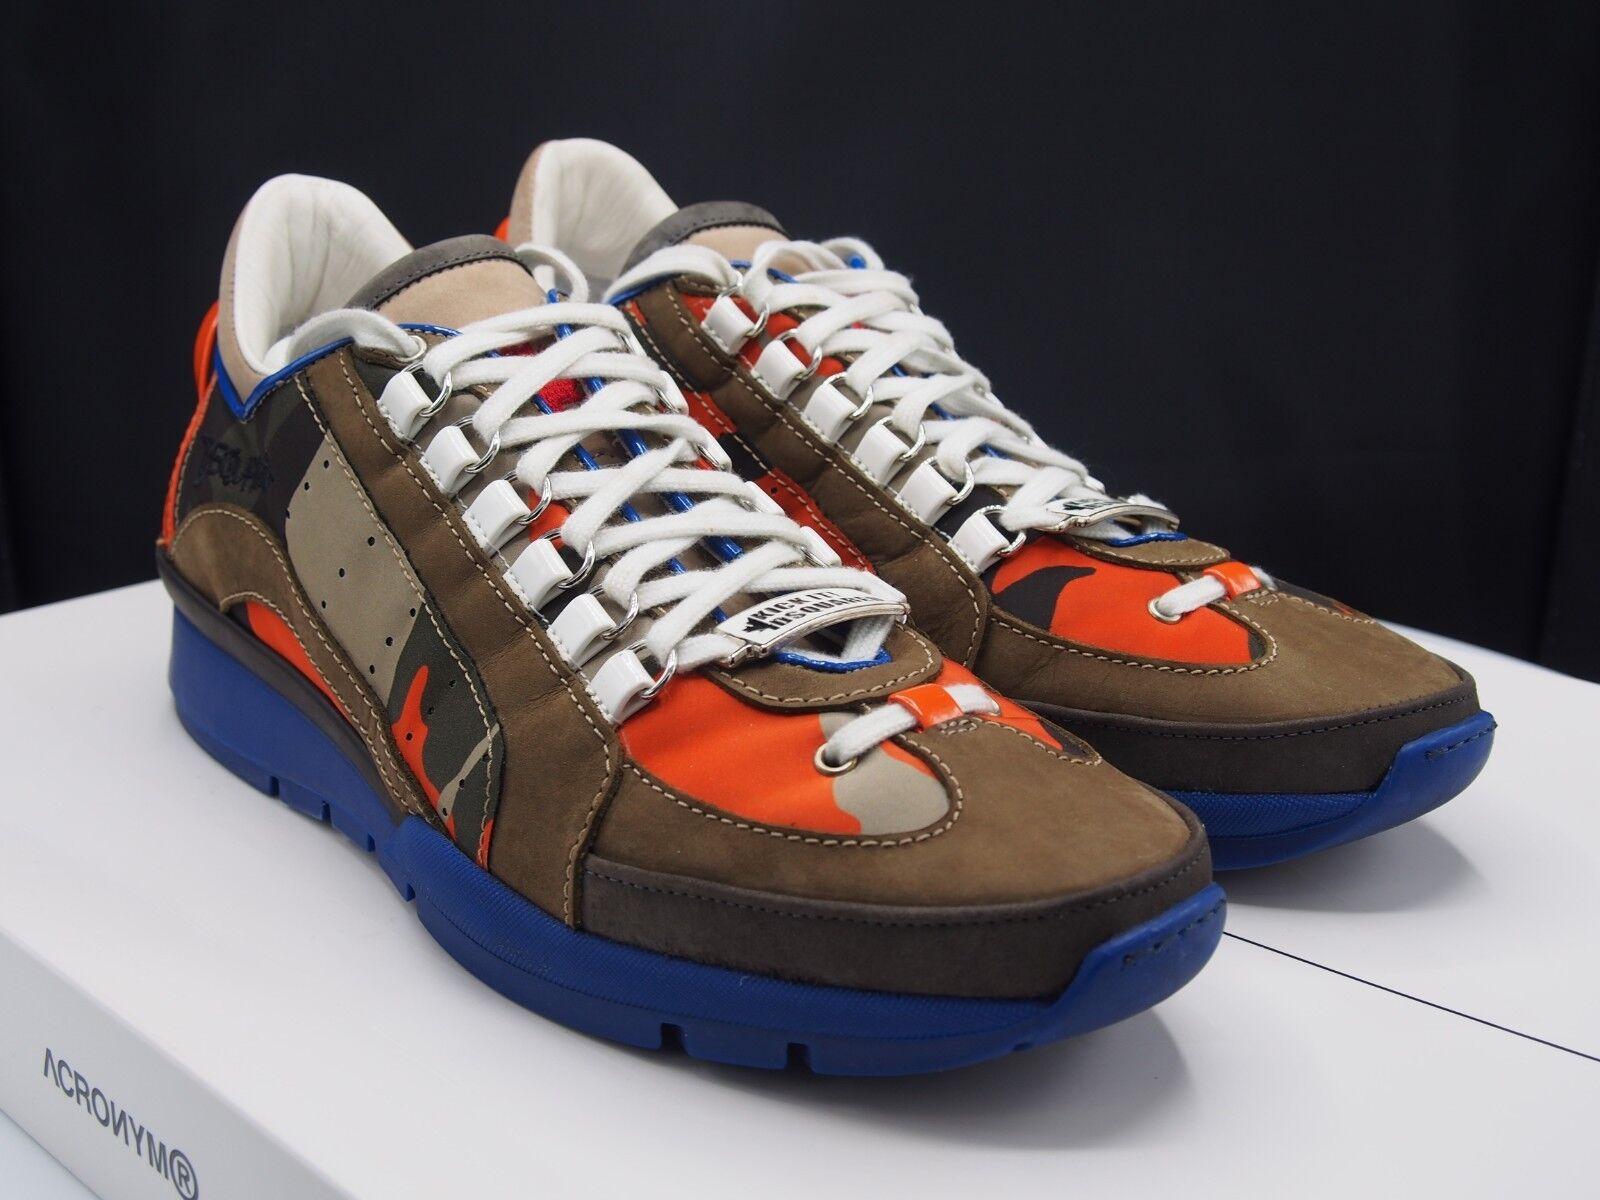 DSquarojo 2 Tech Camo Zapatillas De Hombre  11 US